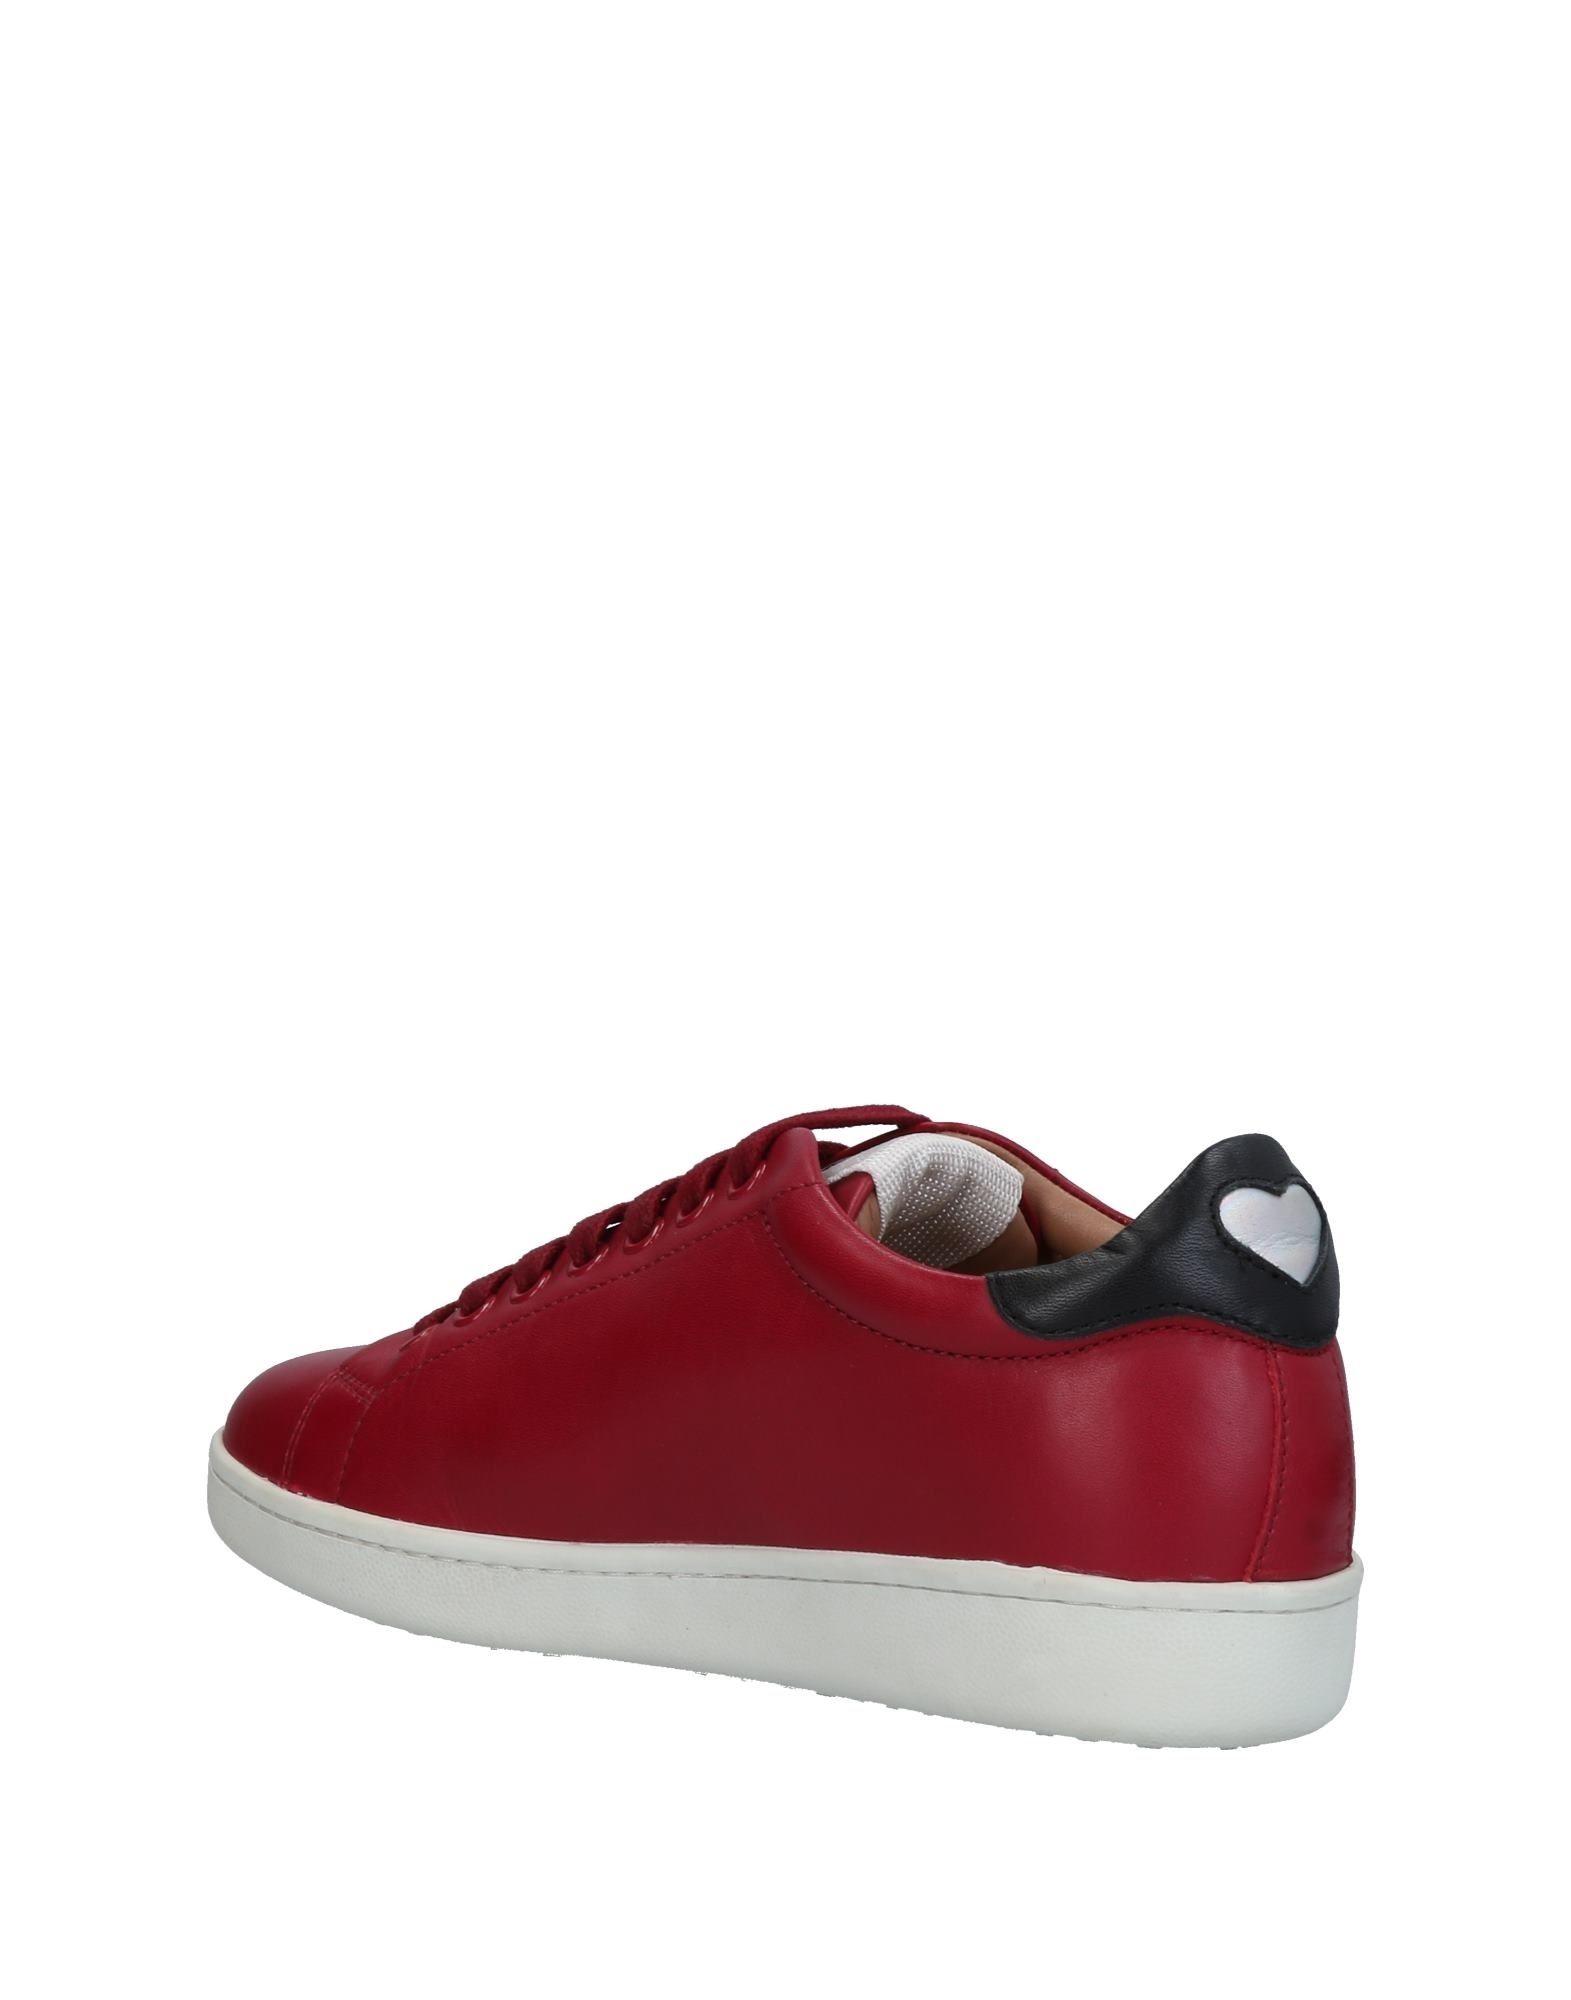 Sneakers Twin-Set Simona Barbieri Femme - Sneakers Twin-Set Simona Barbieri sur